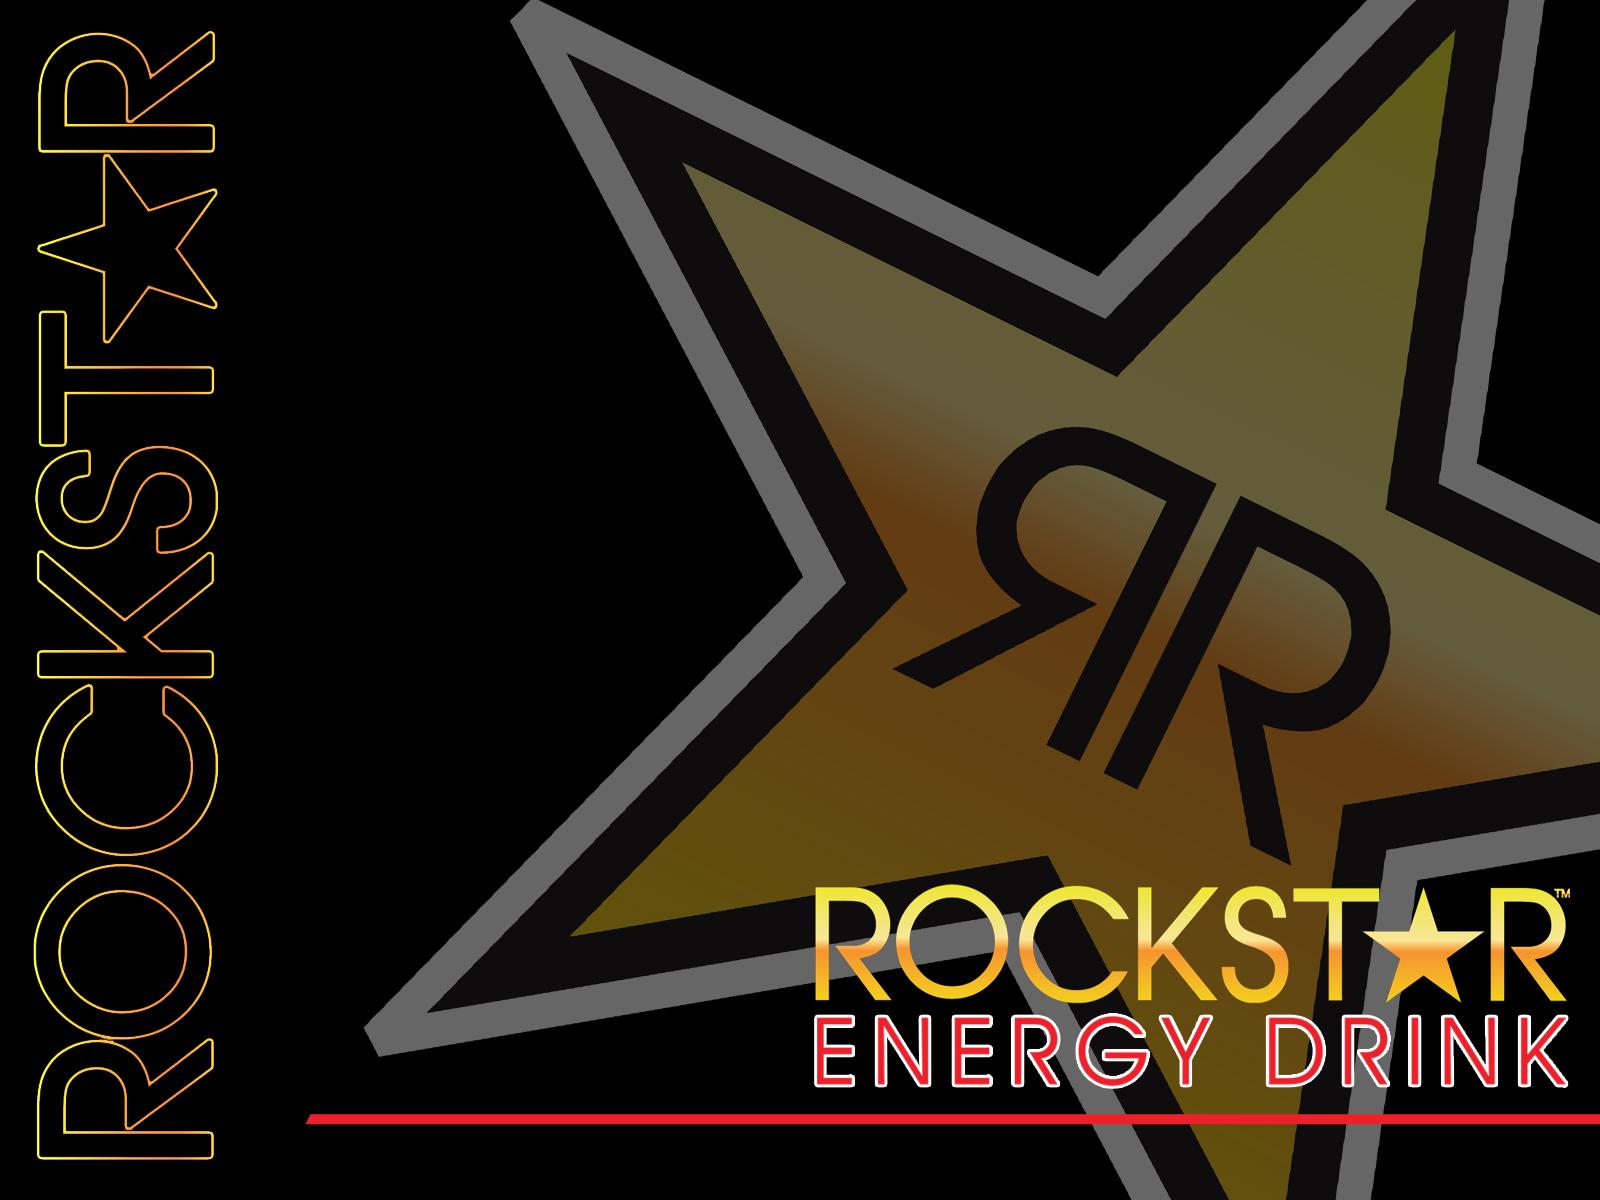 Rockstar Energy Drink wallpaper 88877 1600x1200